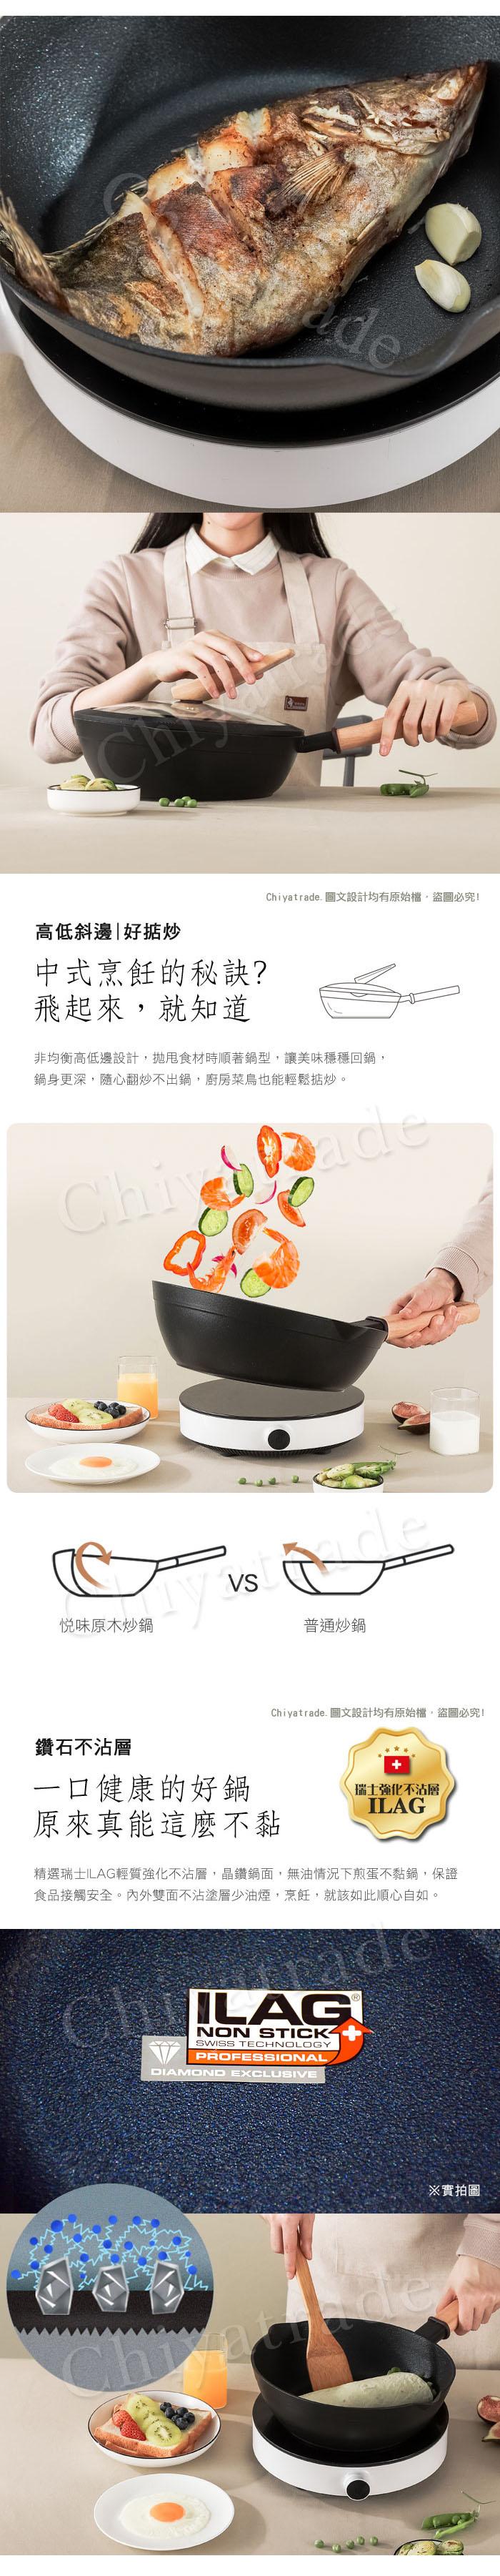 【Taste Plus】悅味元木 鑽石級內外不沾鍋 平底煎鍋 26cm IH全對應(贈原廠鍋蓋+木鏟)